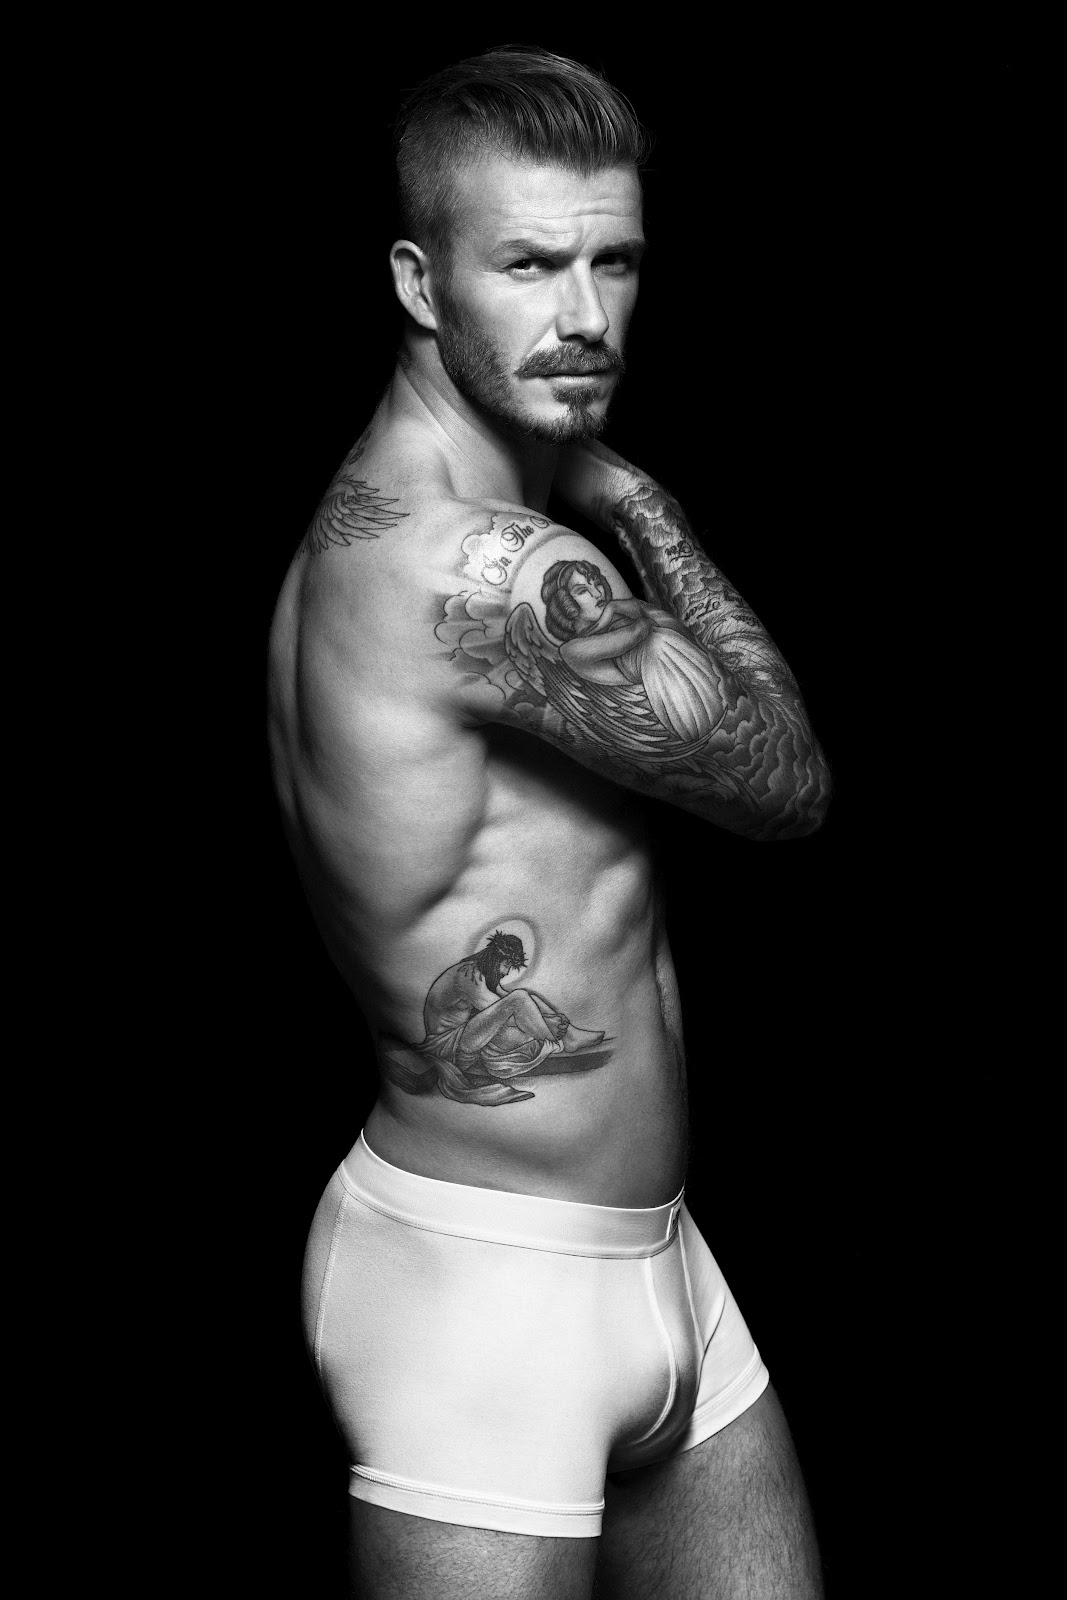 http://1.bp.blogspot.com/-_WGsfvJJ1jc/UEfIG4Q25PI/AAAAAAAALTs/-L7WuTAc3po/s1600/David+Beckham+underwear.jpg